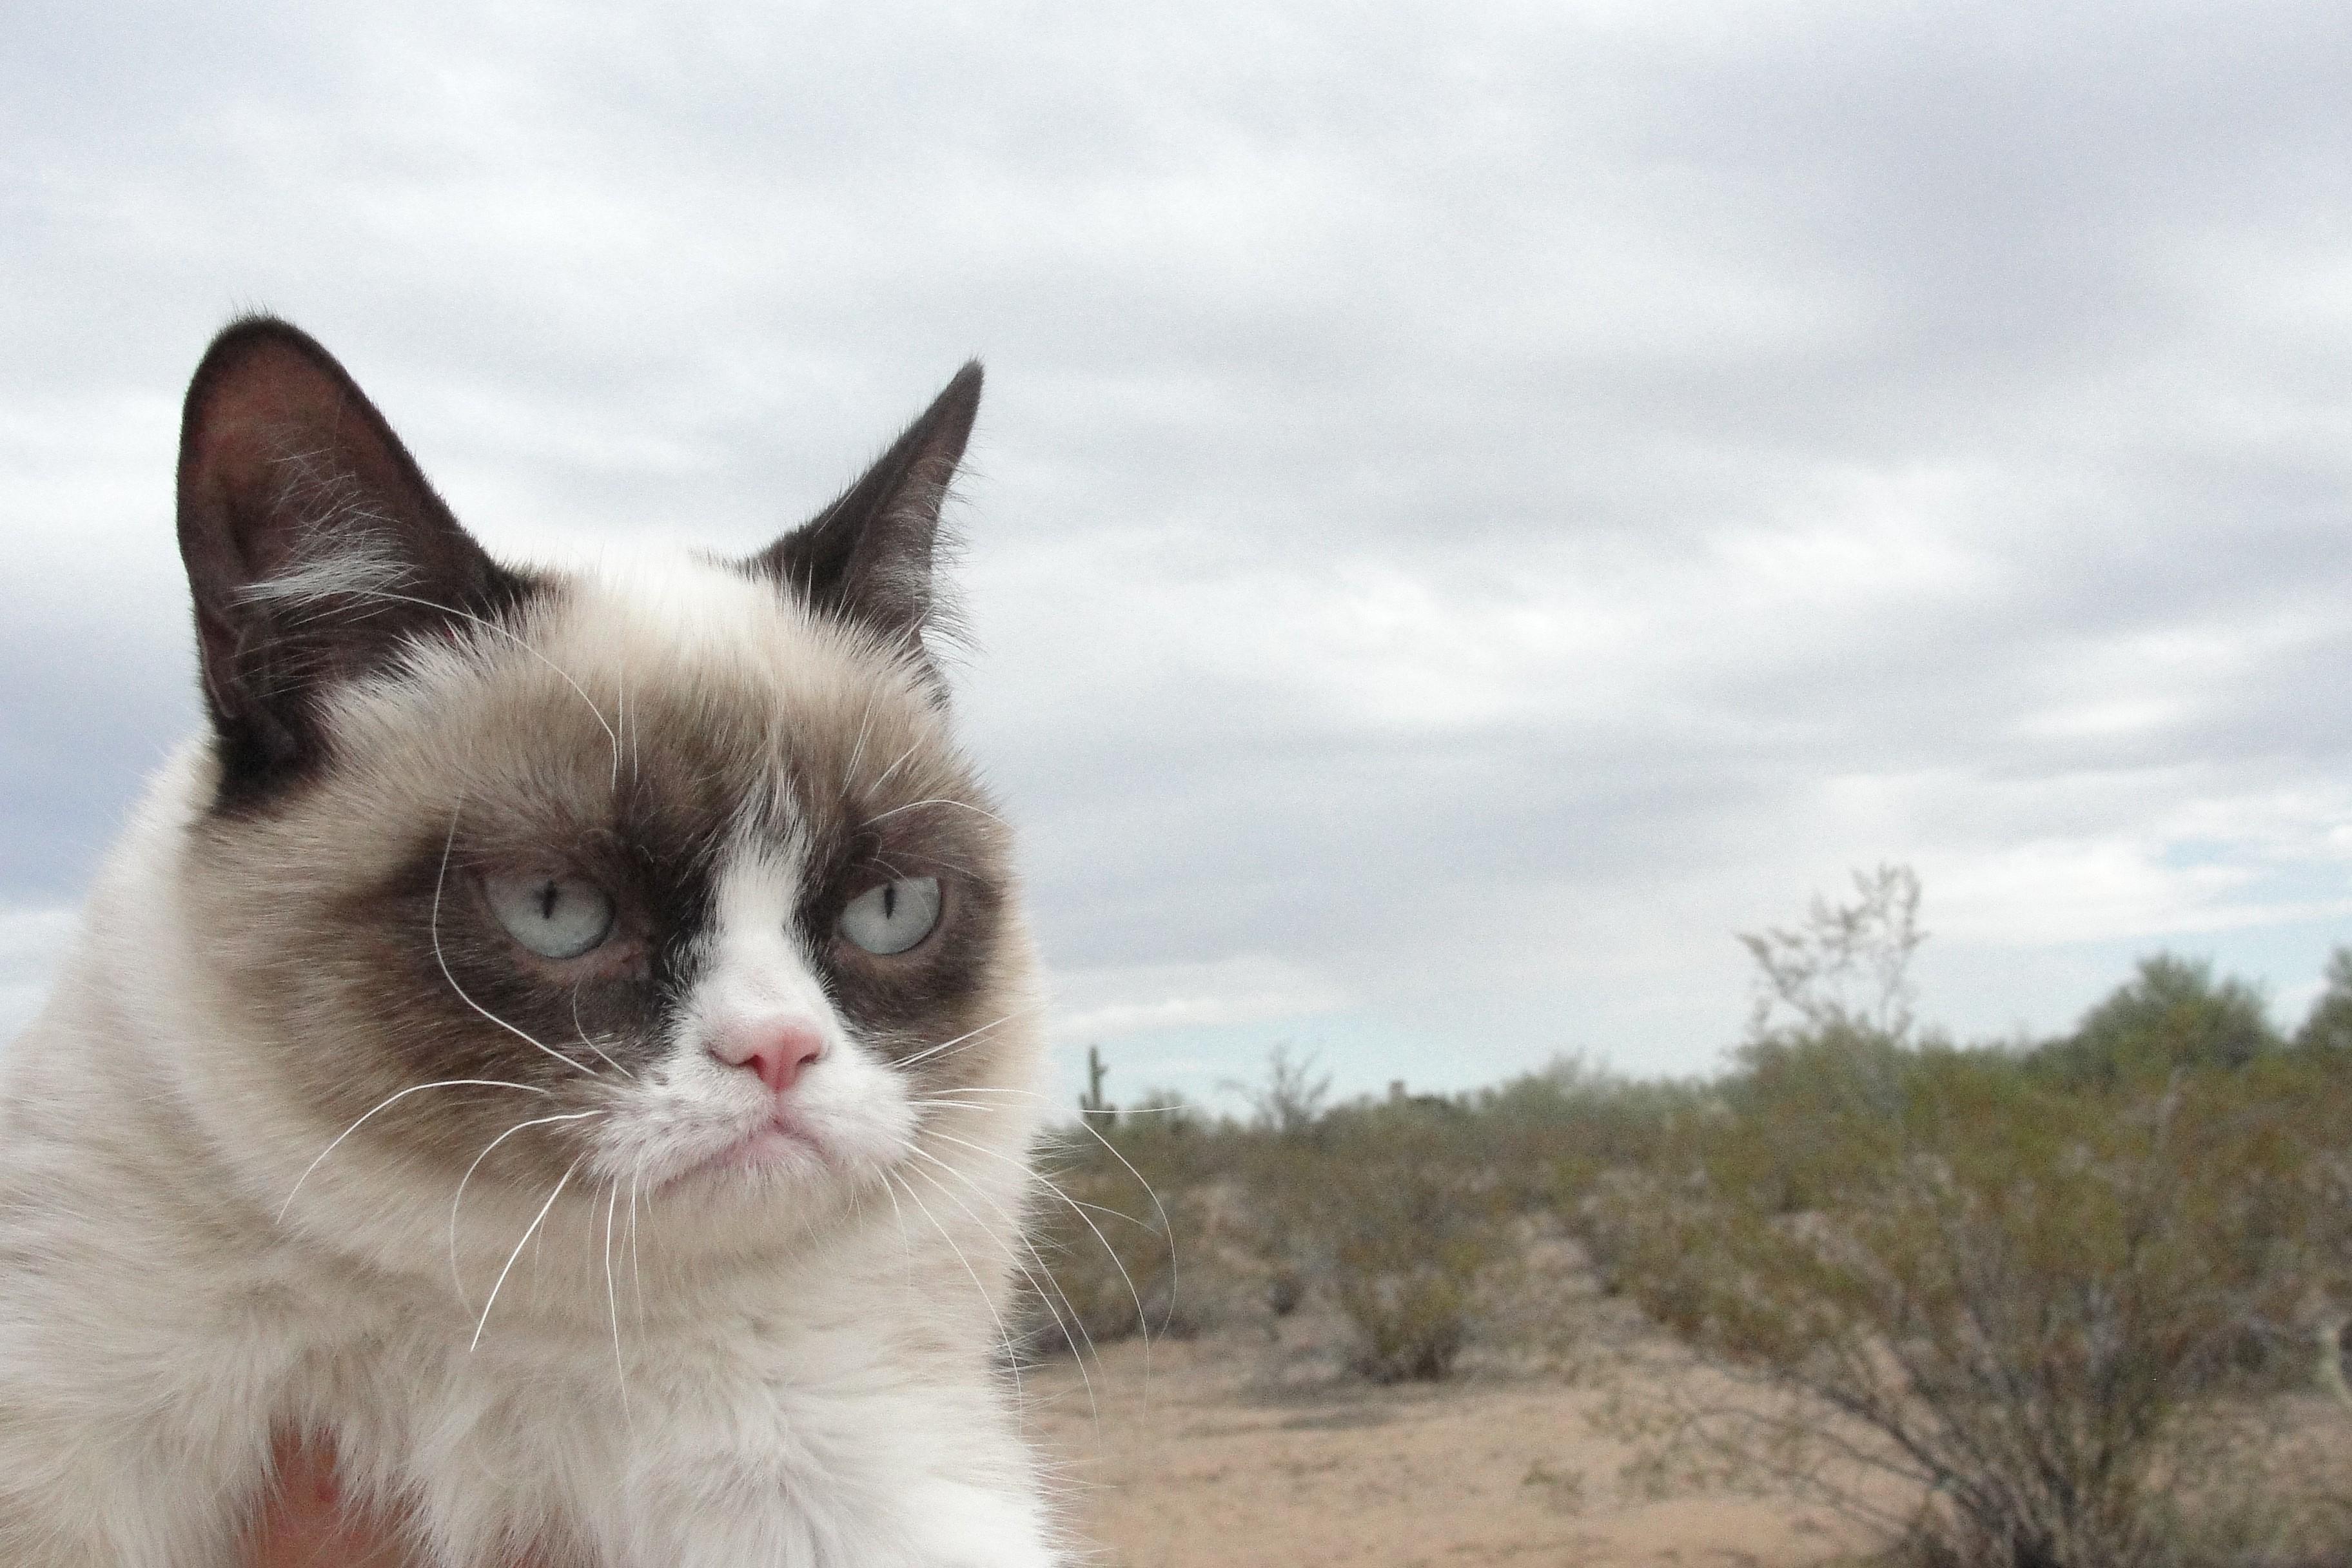 Animals___Cats_Grumpy_cat_in_the_desert_043850_